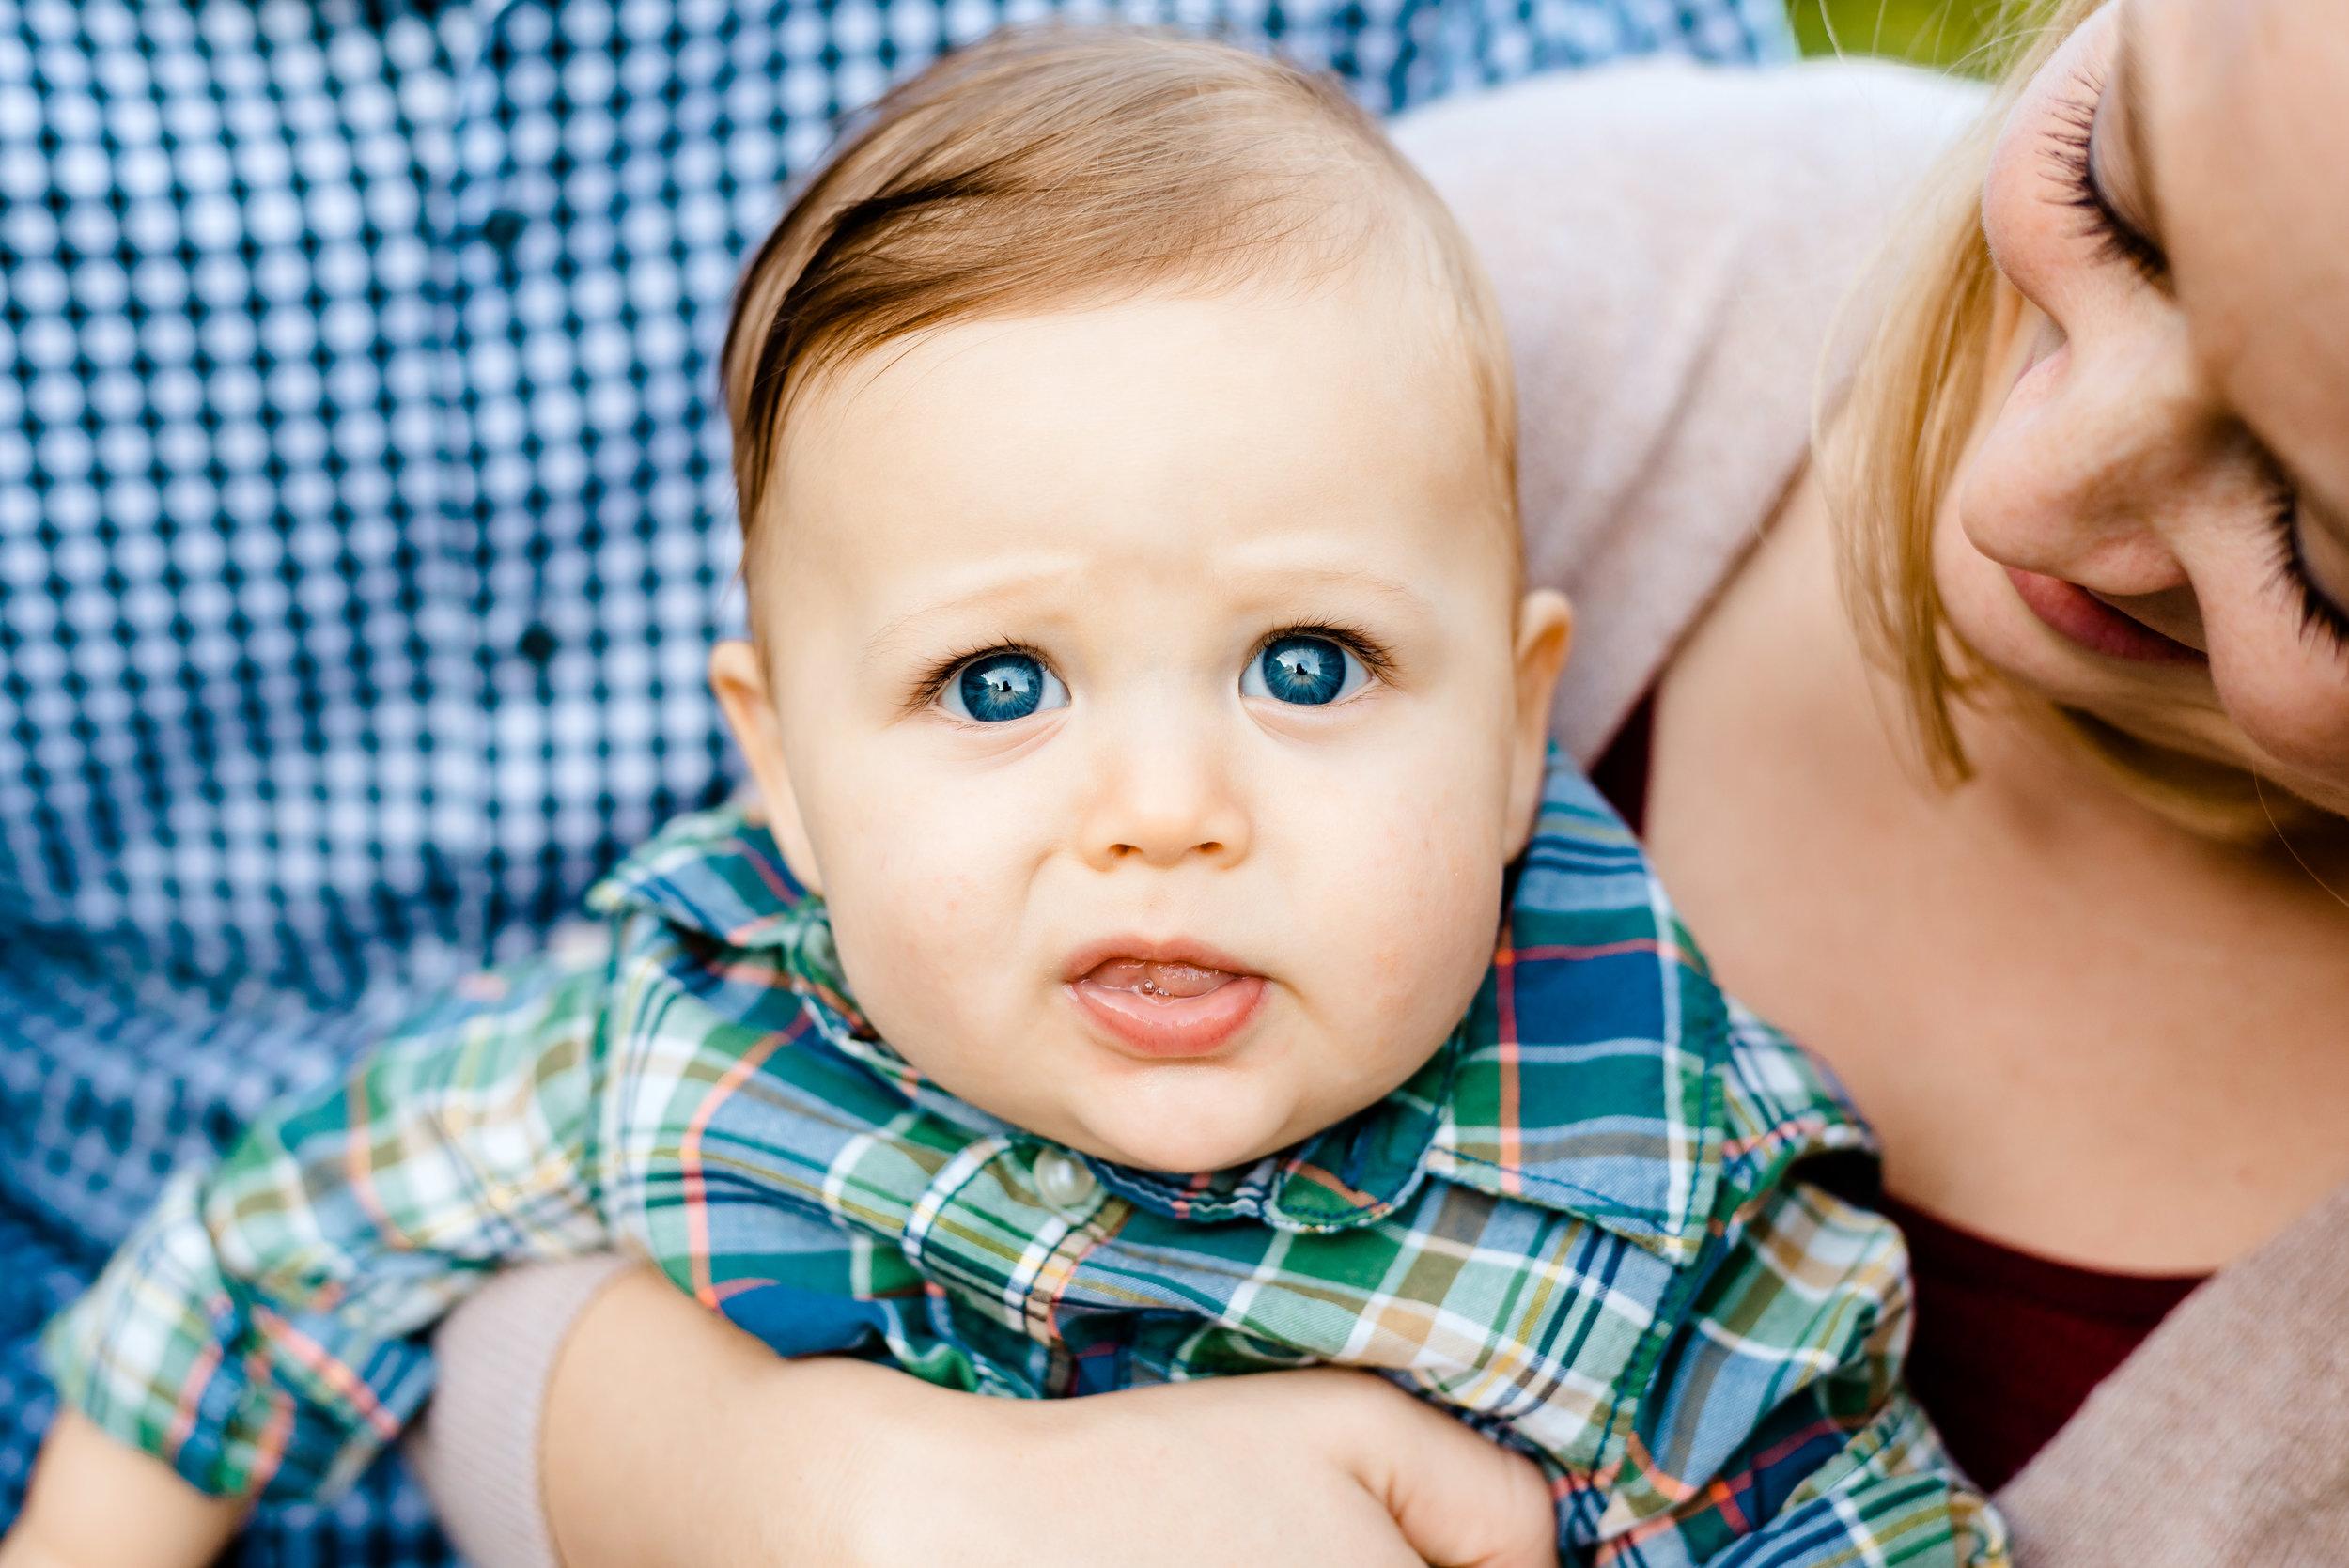 Laur Robinson Photography | www.laurarobinsonphoto.com